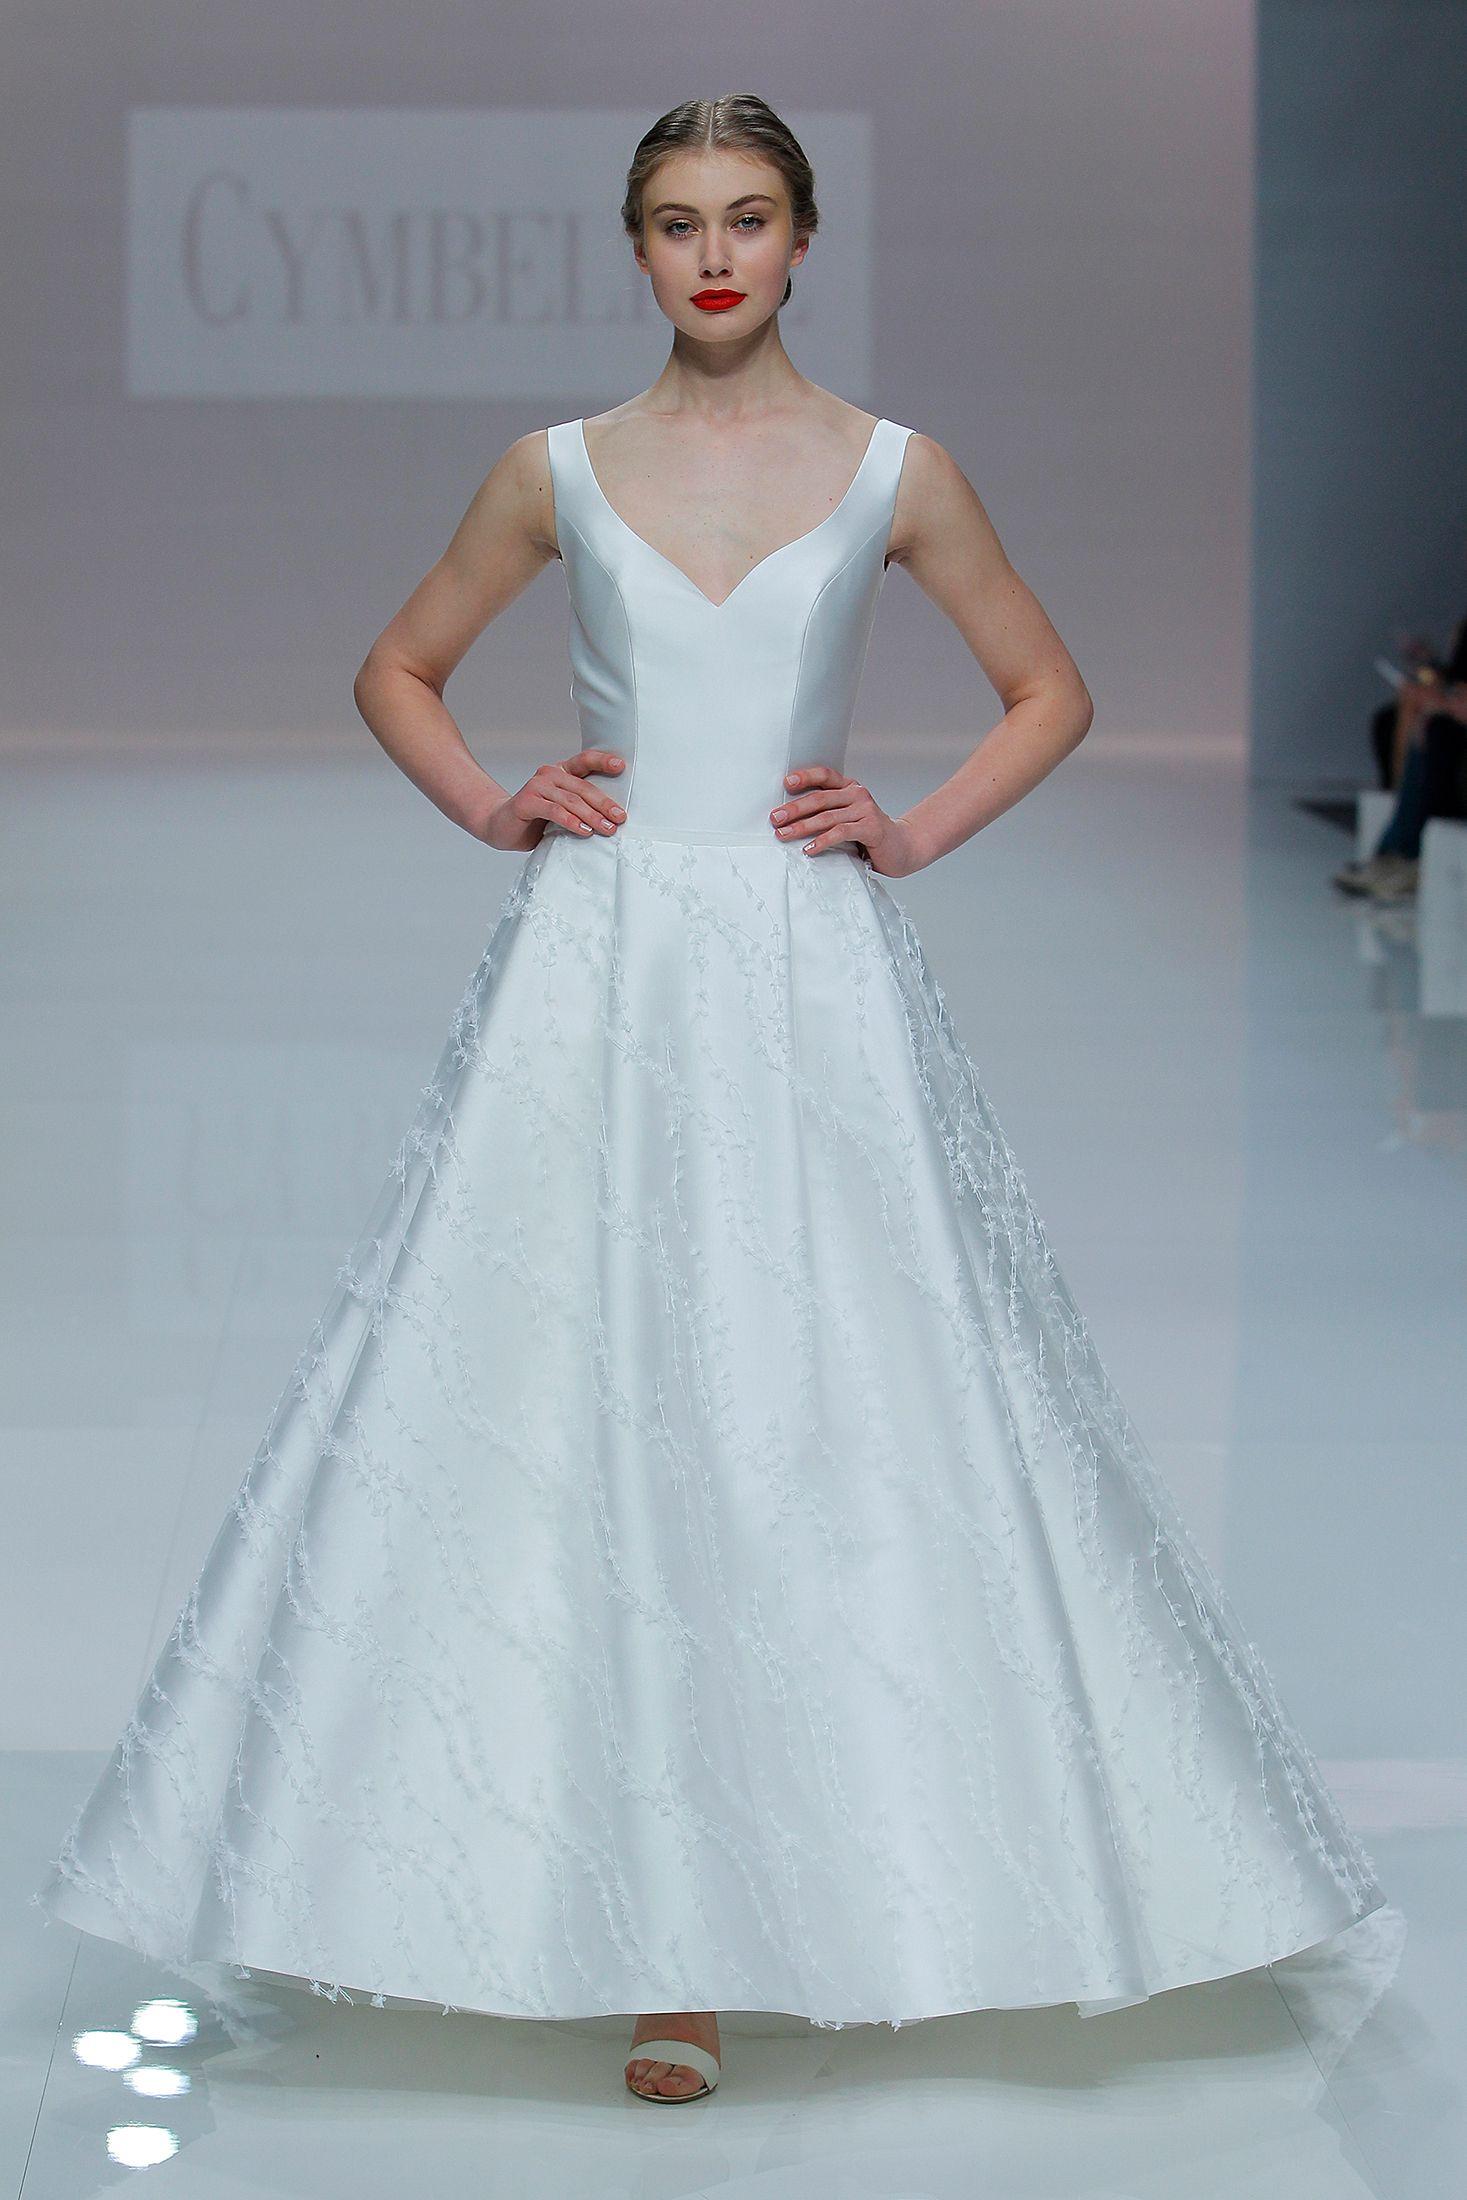 Vestido de Novia de Cymbeline - CY 062 #wedding #bodas #boda ...